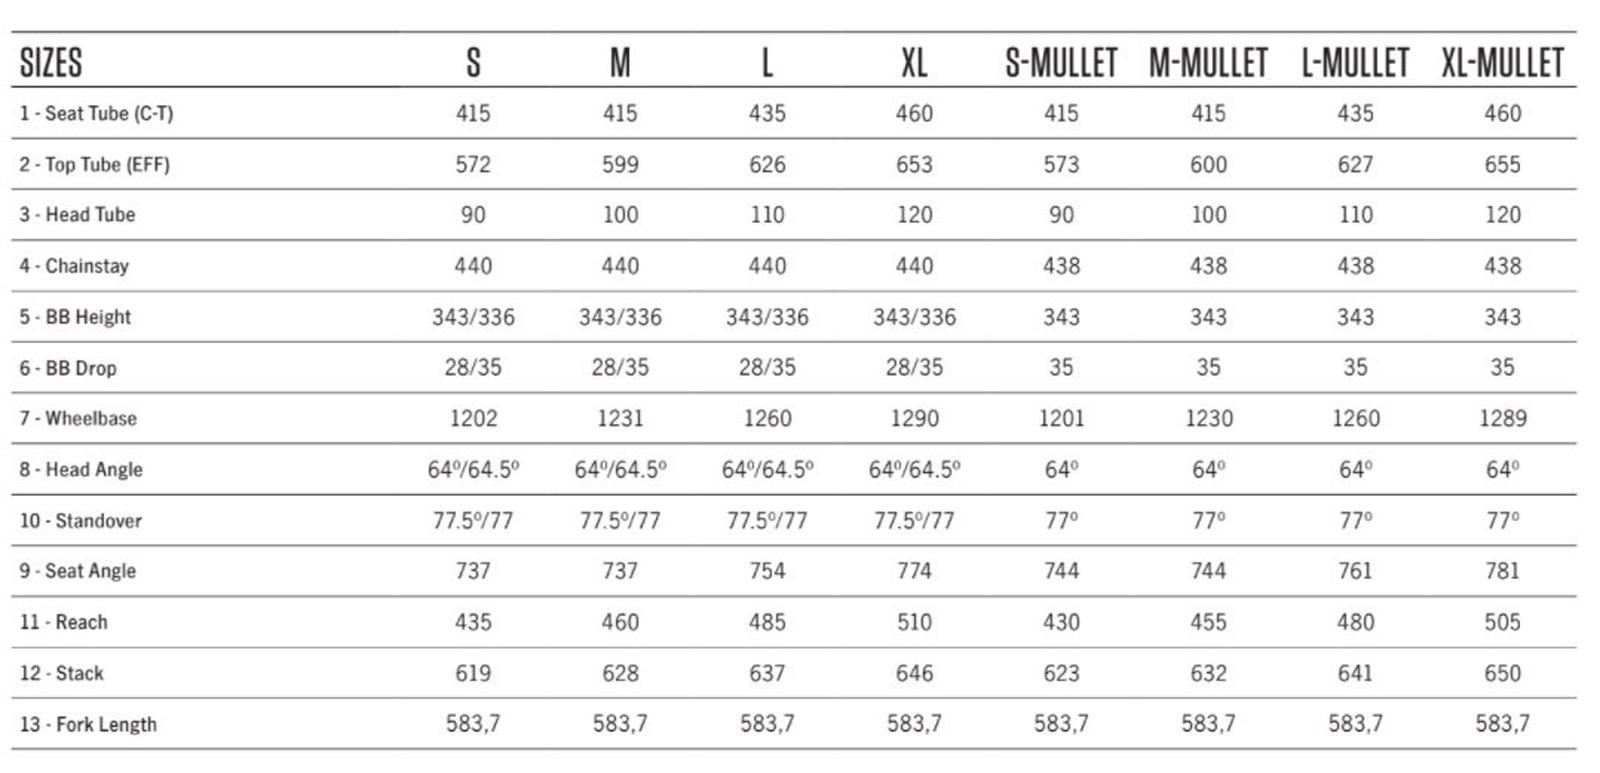 2022 ORBEA RALLON 29ER MULLET GEOMETRY CHARTS